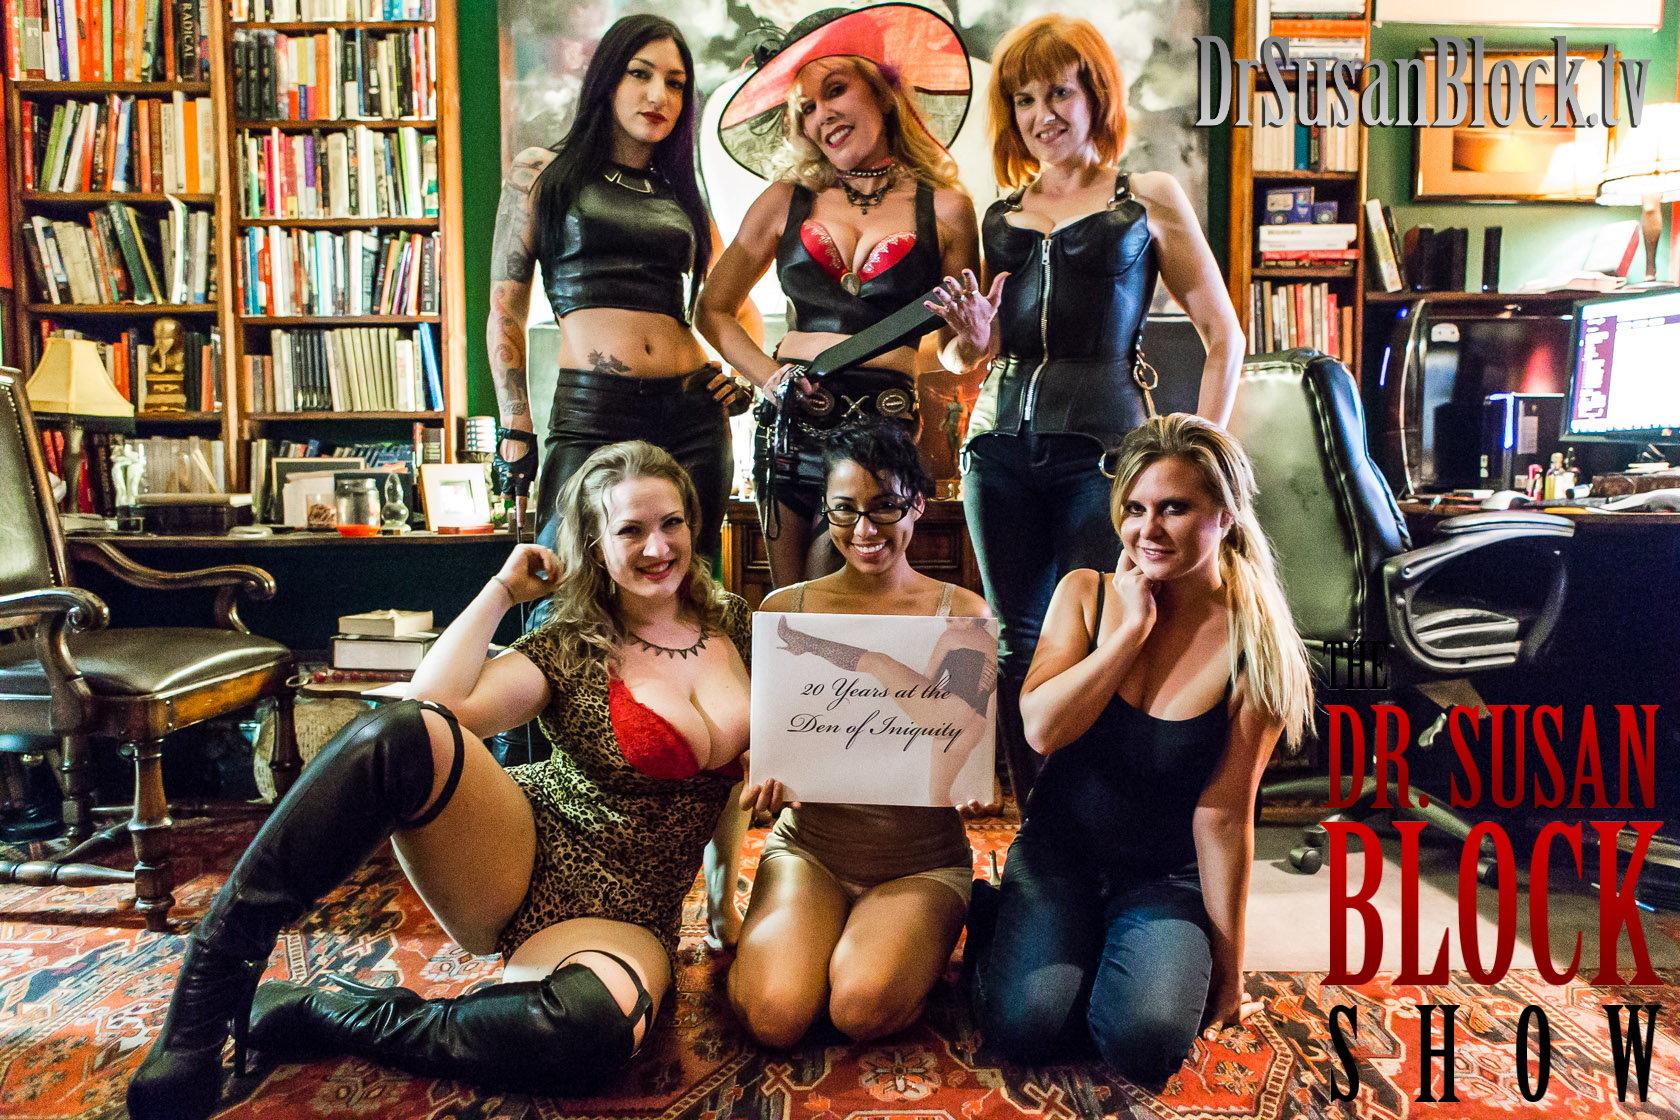 Den of Iniquity 20th Anniversary: Female Domination Celebration on DrSuzy.Tv !